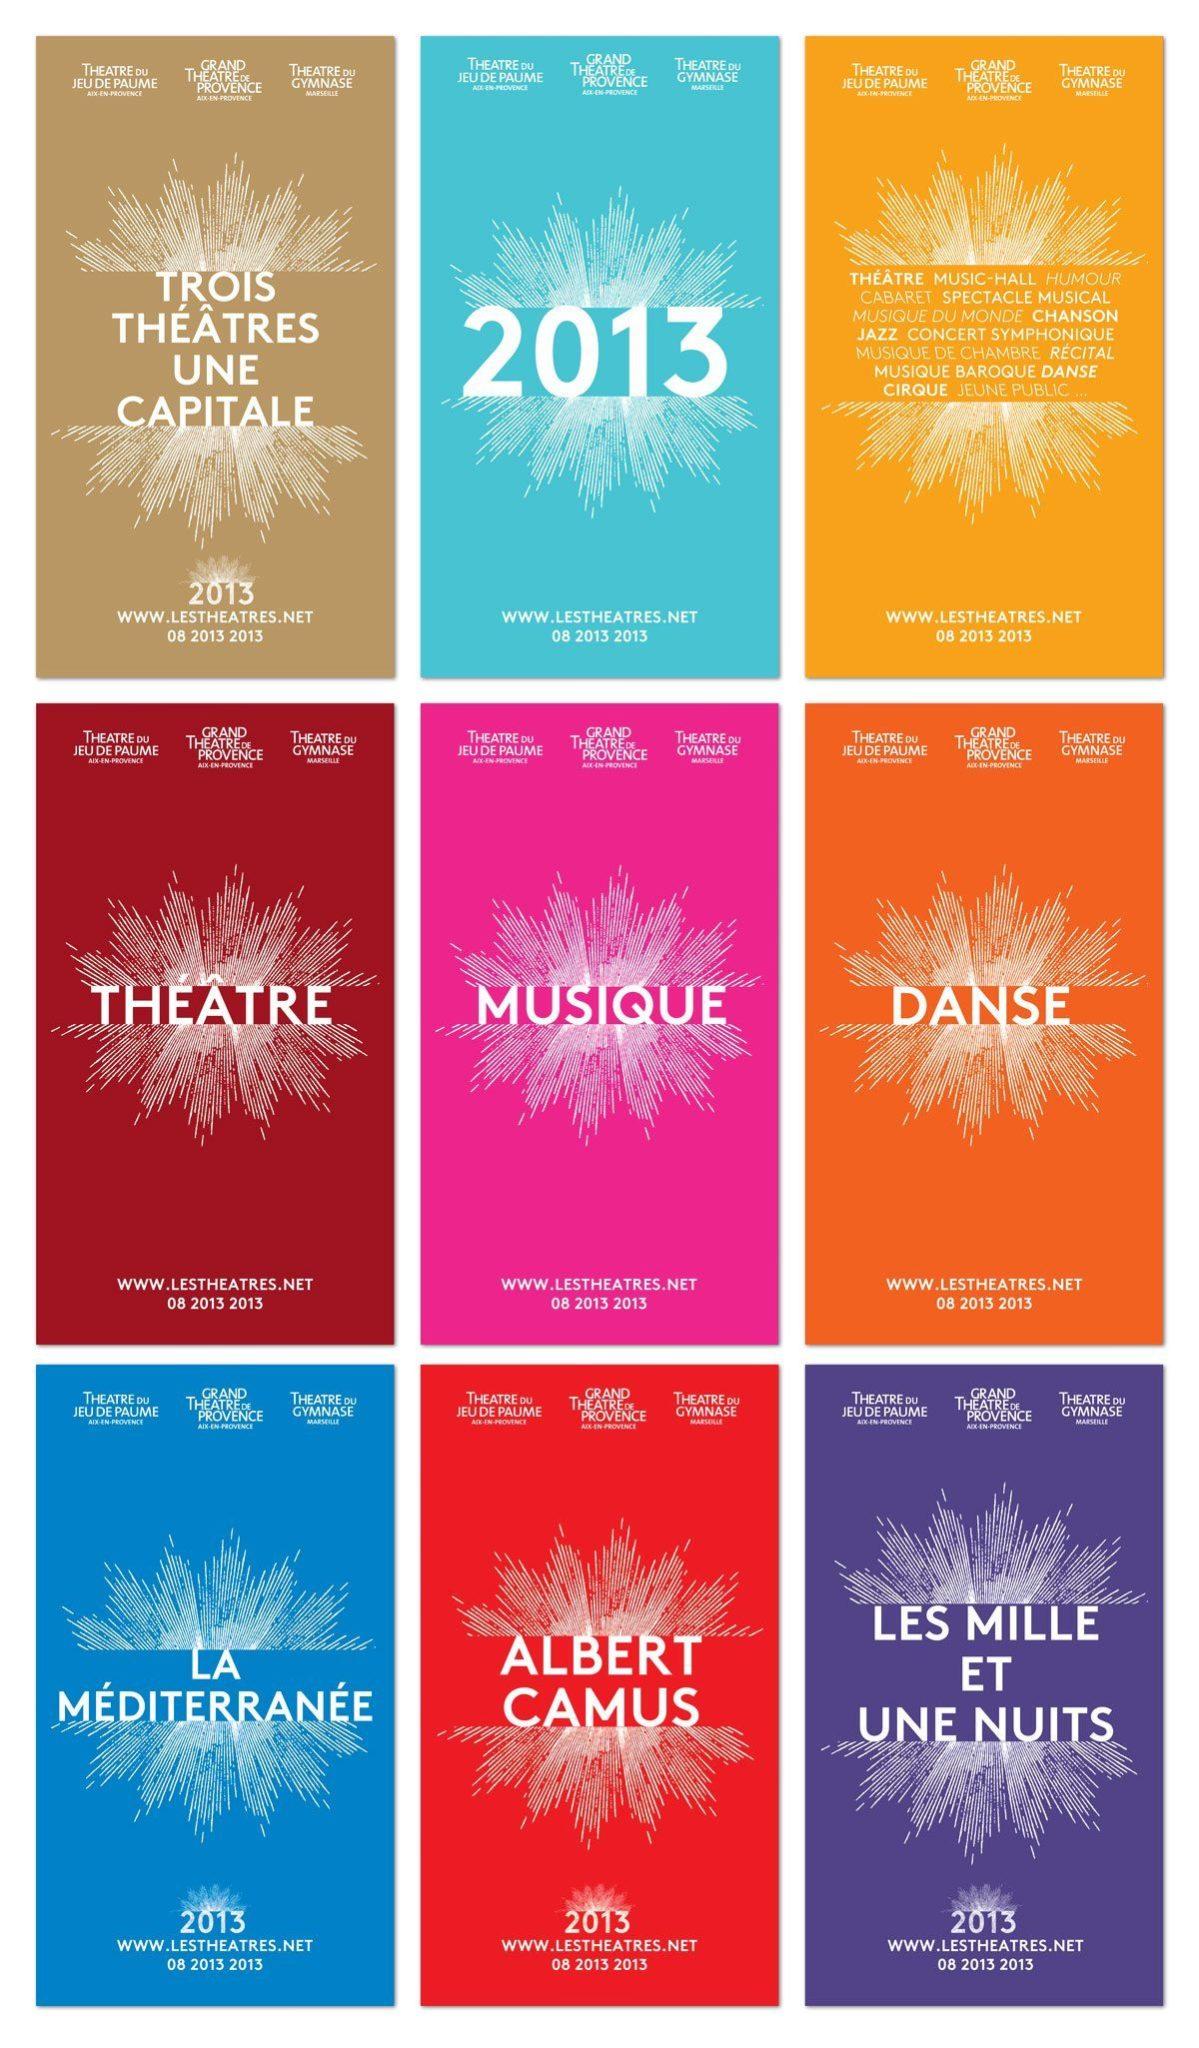 kakemono-les-theatres-2013--ichetkar